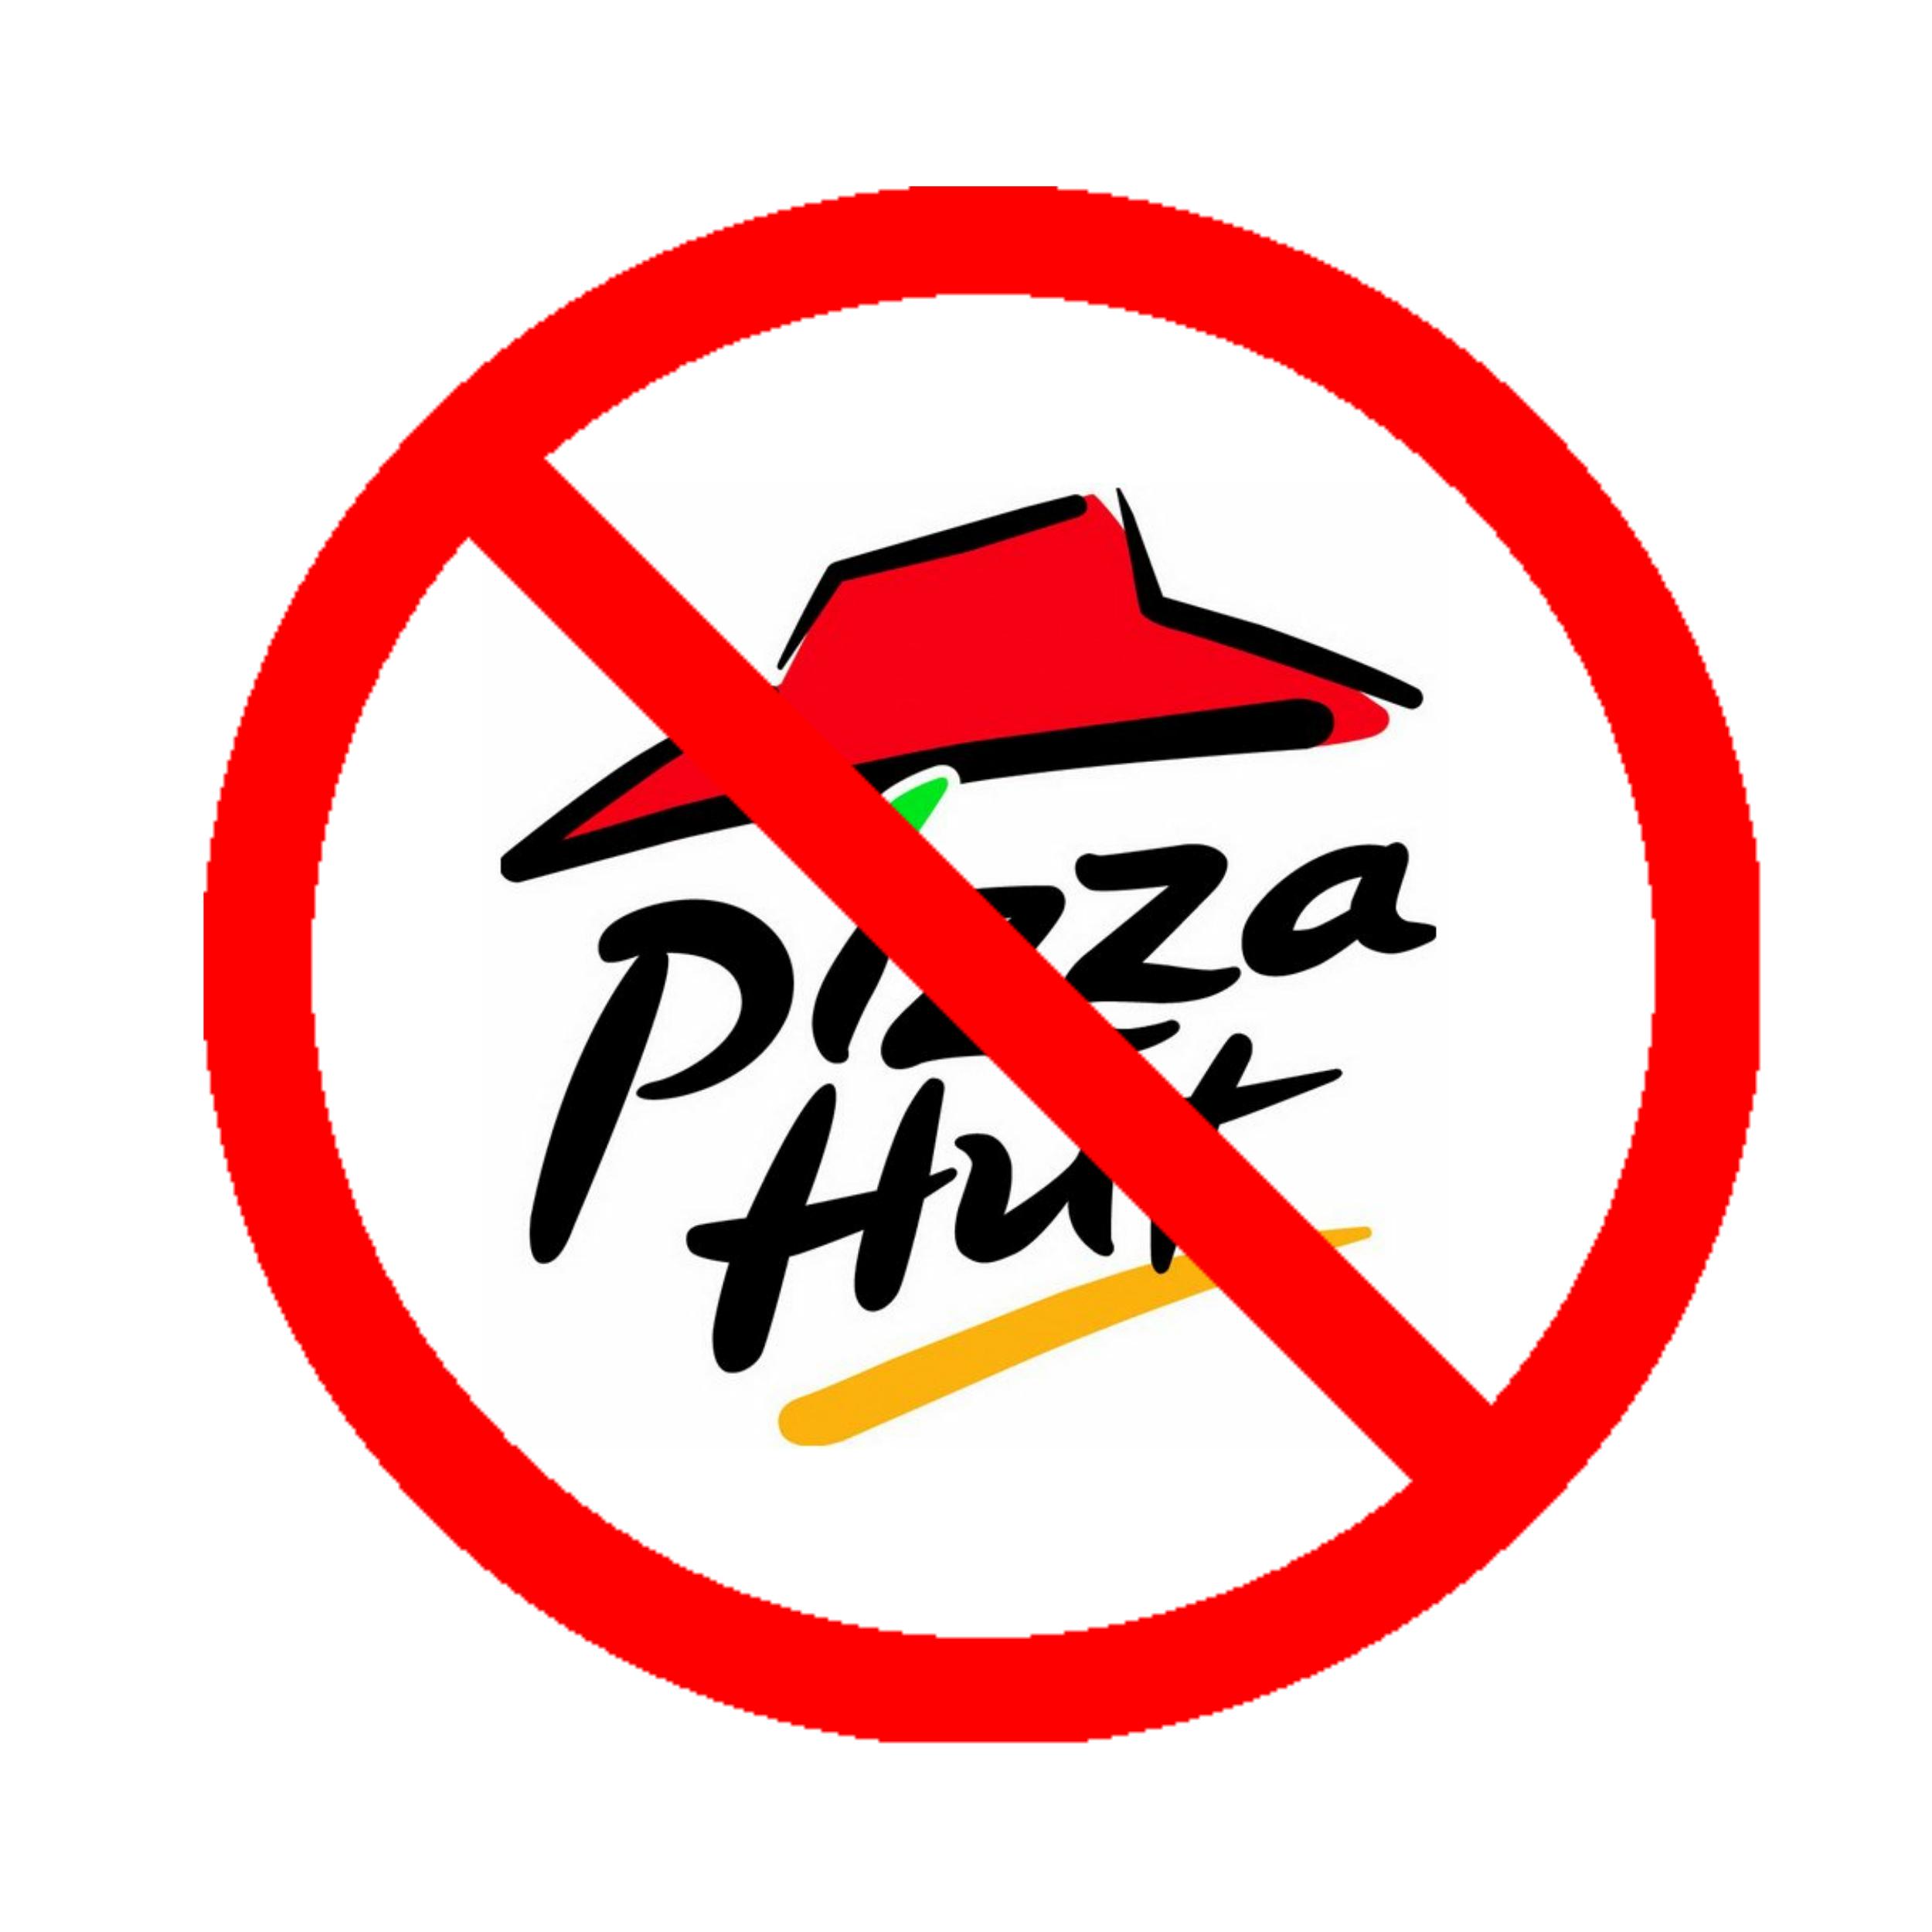 pizzagate (2)